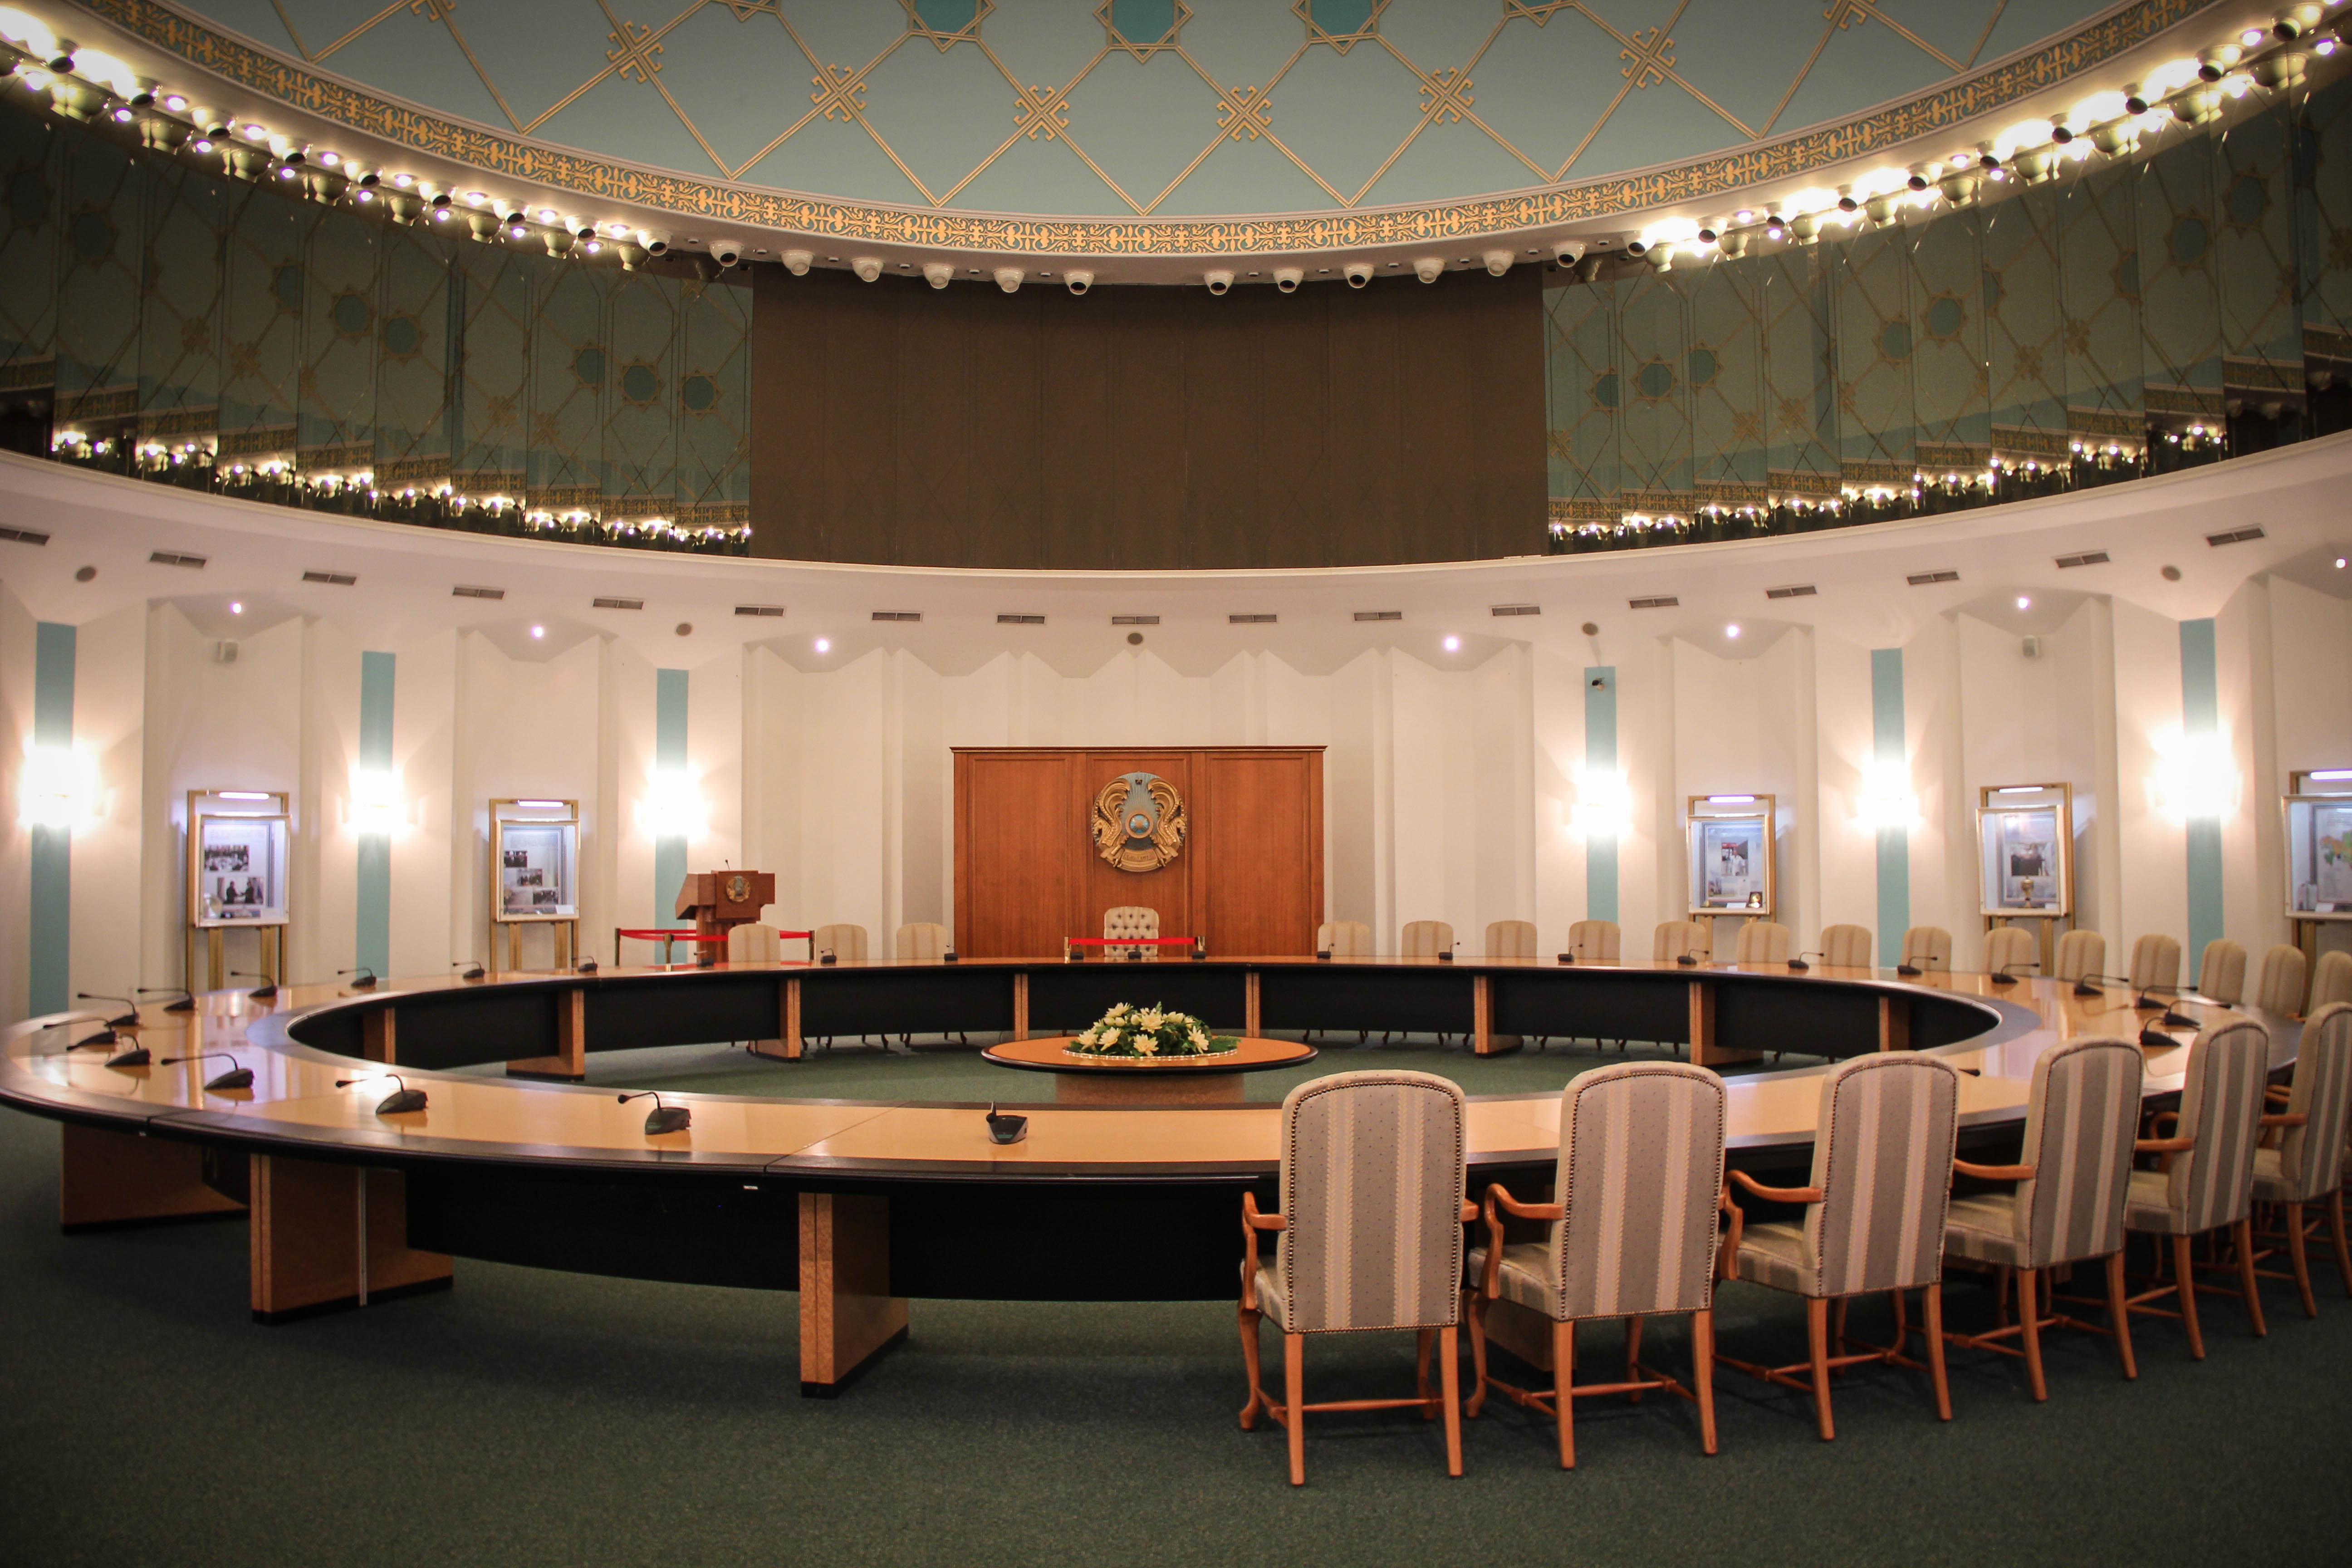 Конференц-зал в музее Первого Президента в Астане_ITmart.kz